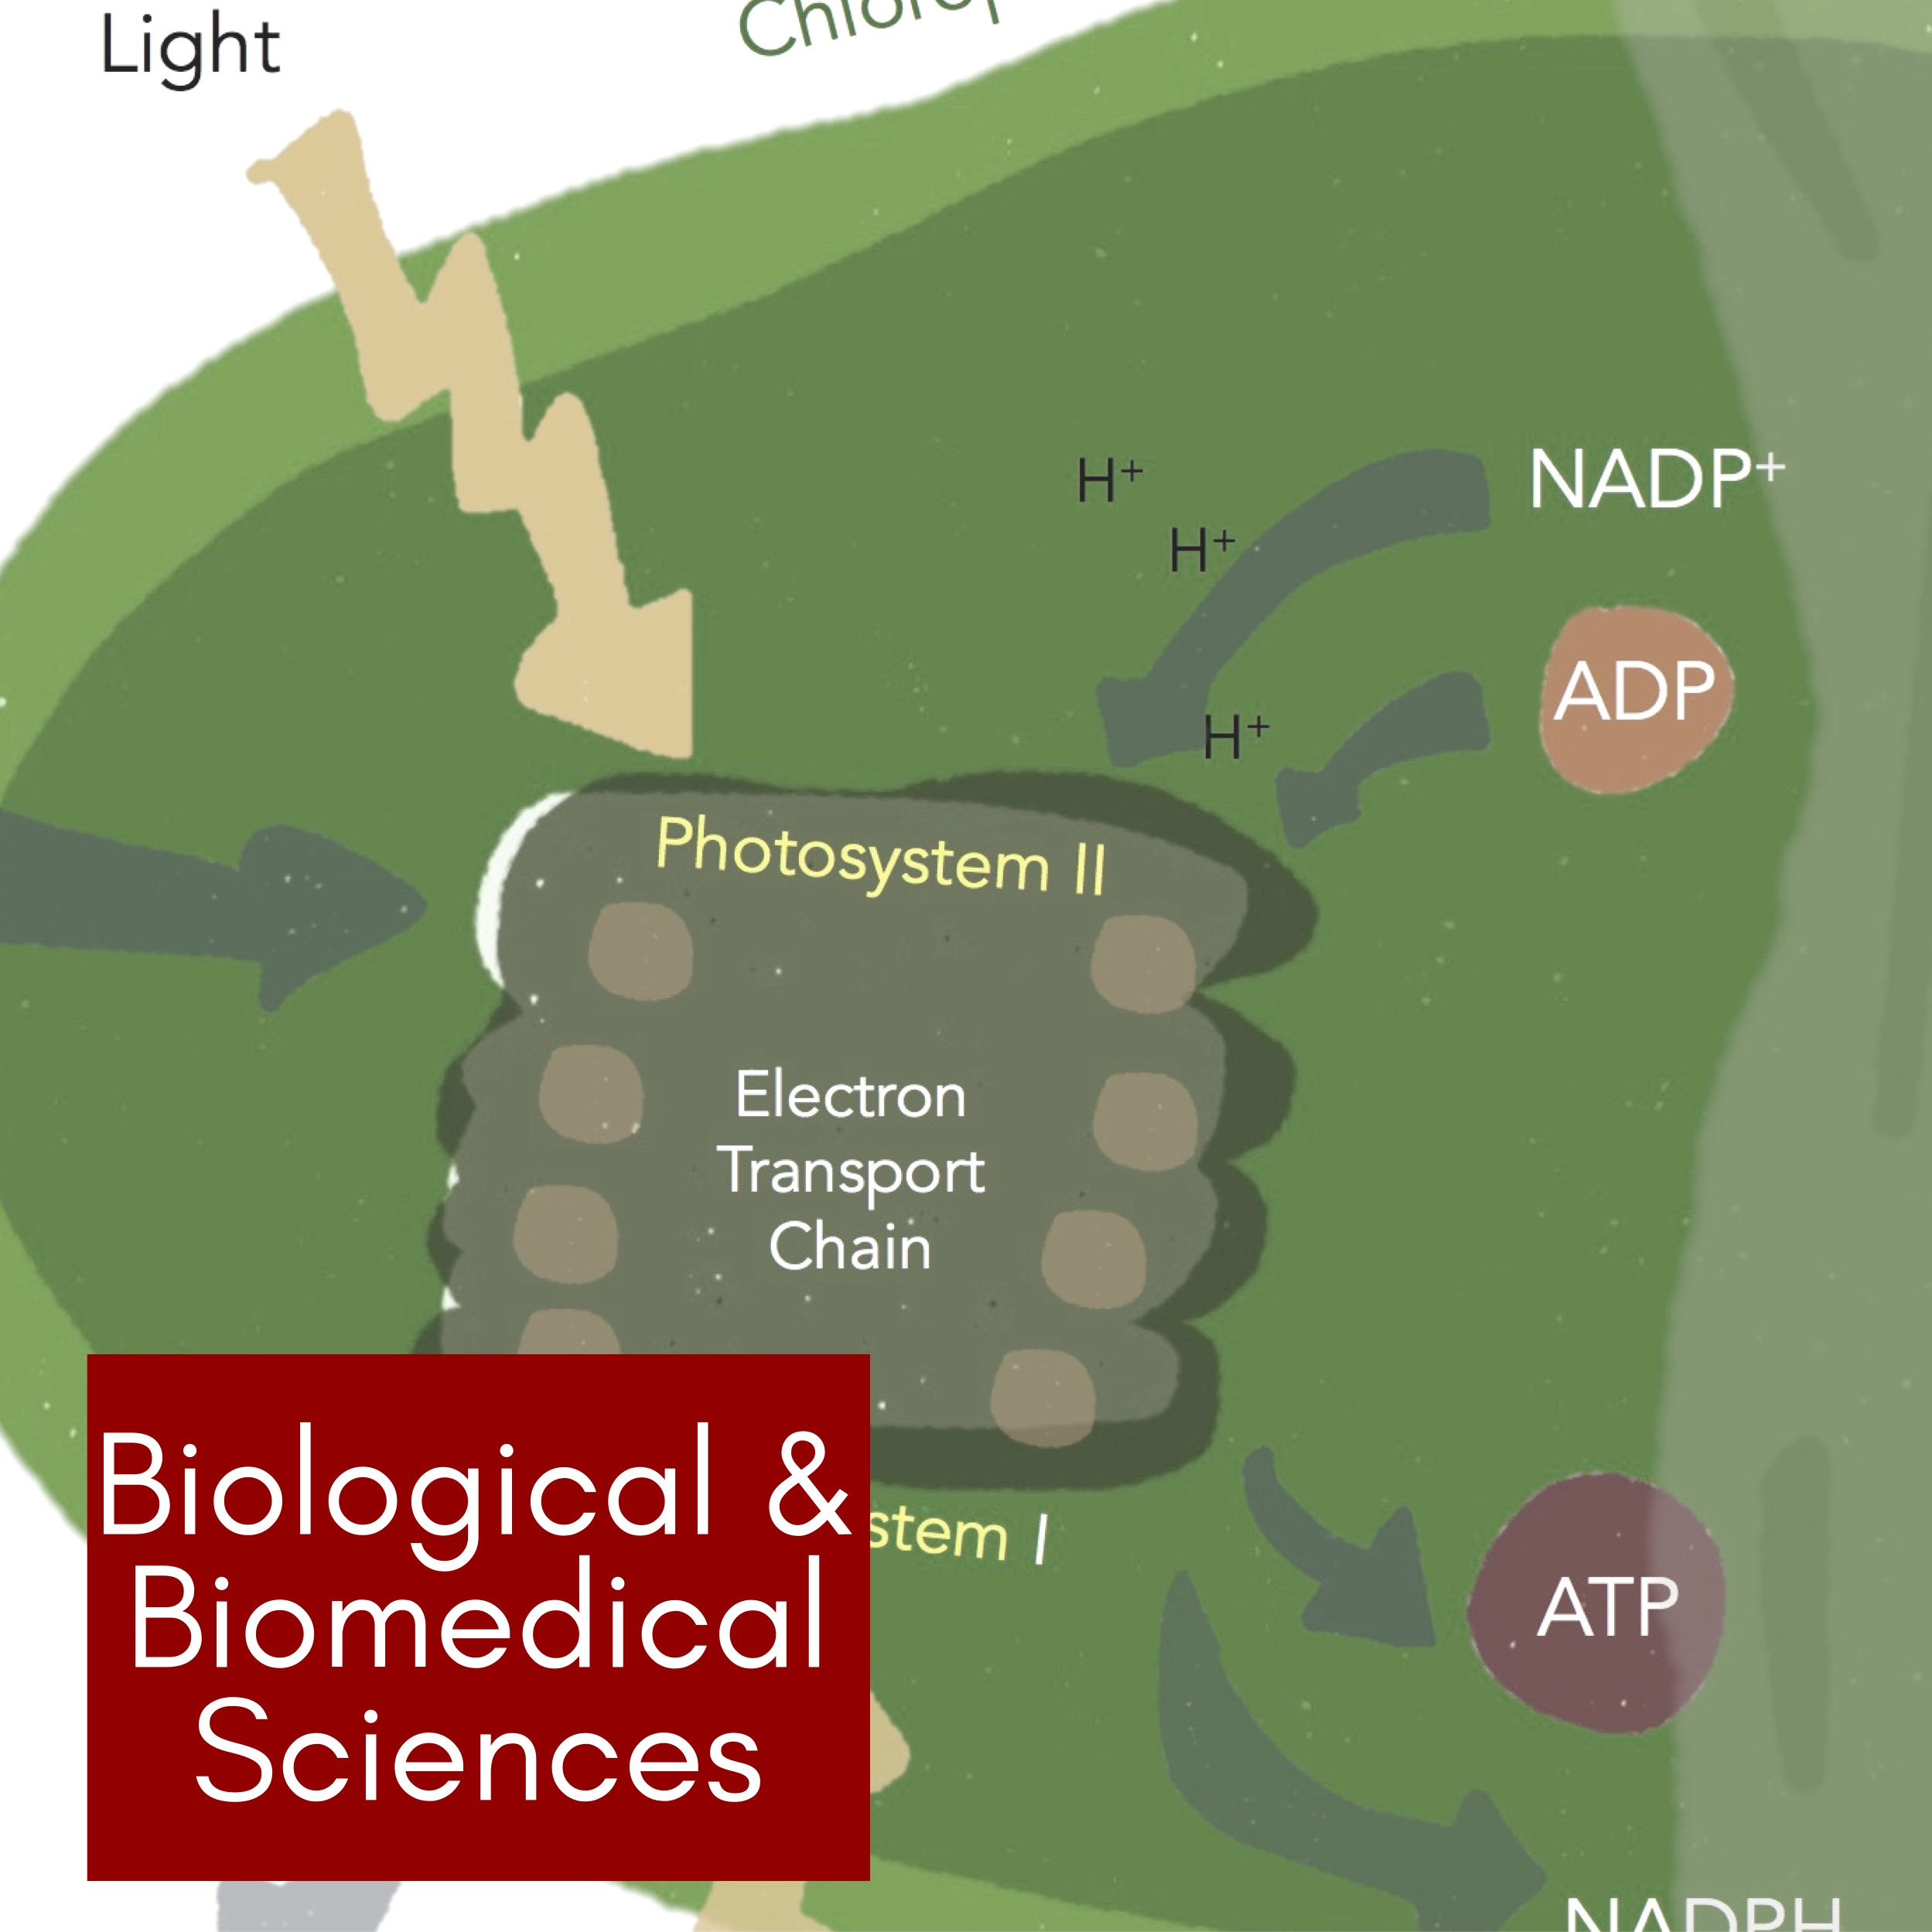 Biology/ Biomedical Sciences -